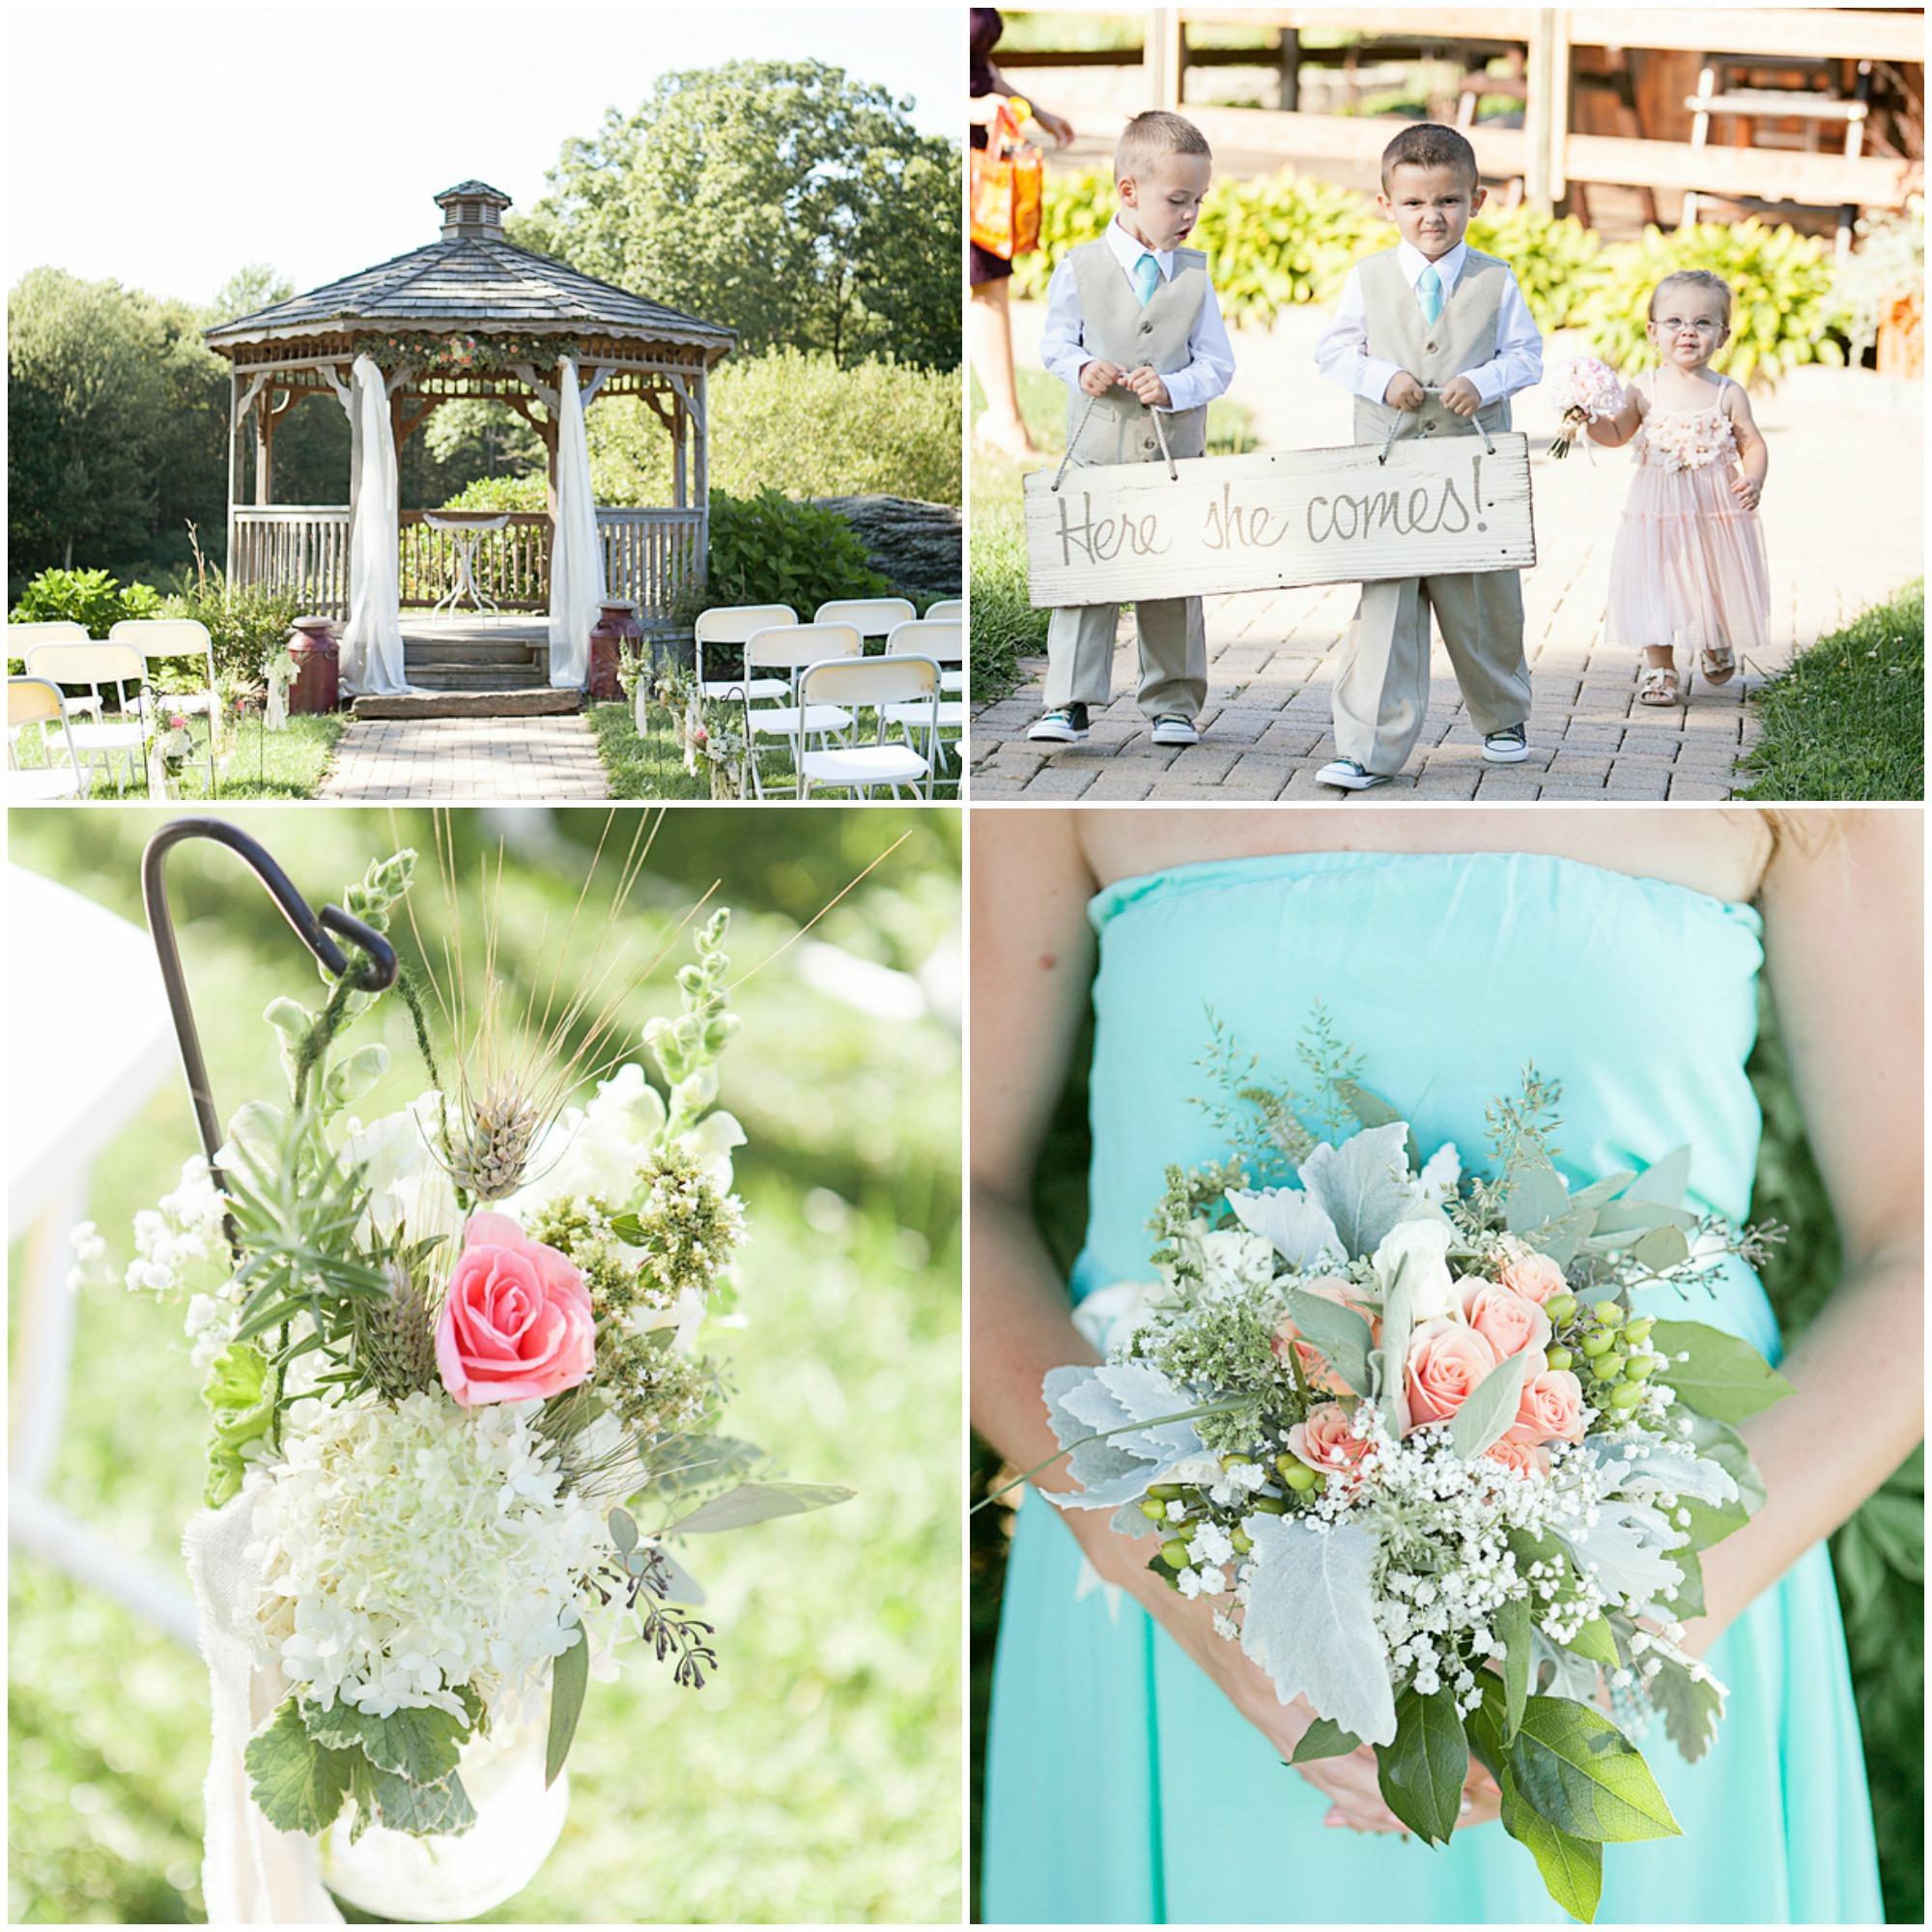 Outdoor Wedding Illinois: Wood Acres Farm Connecticut Wedding